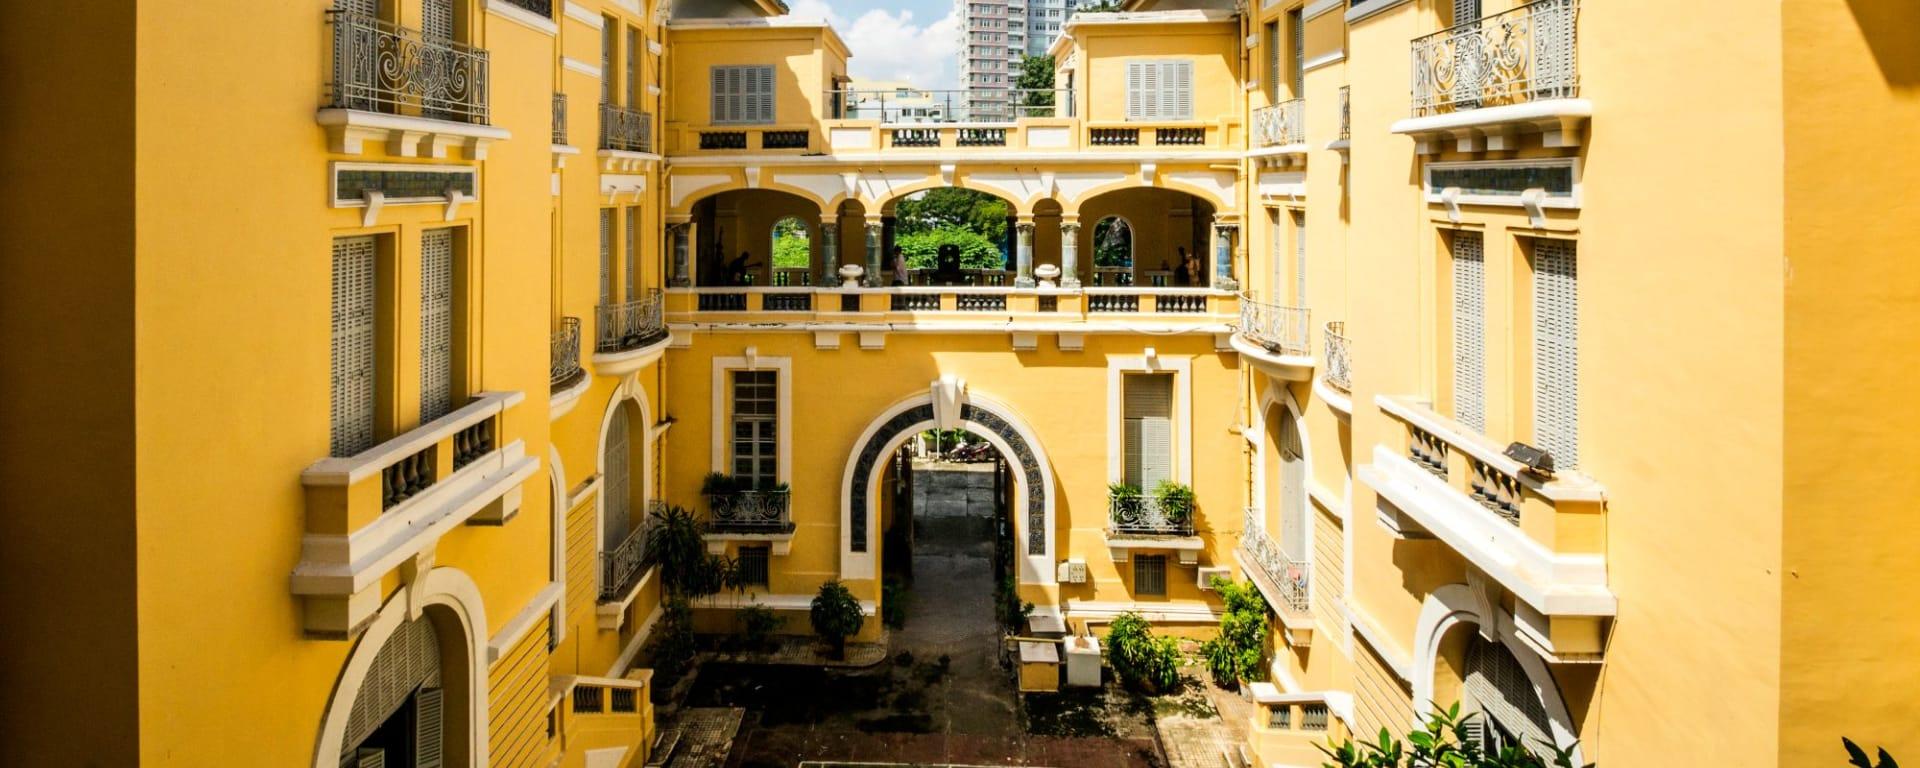 Saigon auf eigene Faust - ganzer Tag: Saigon Fine Arts Museum